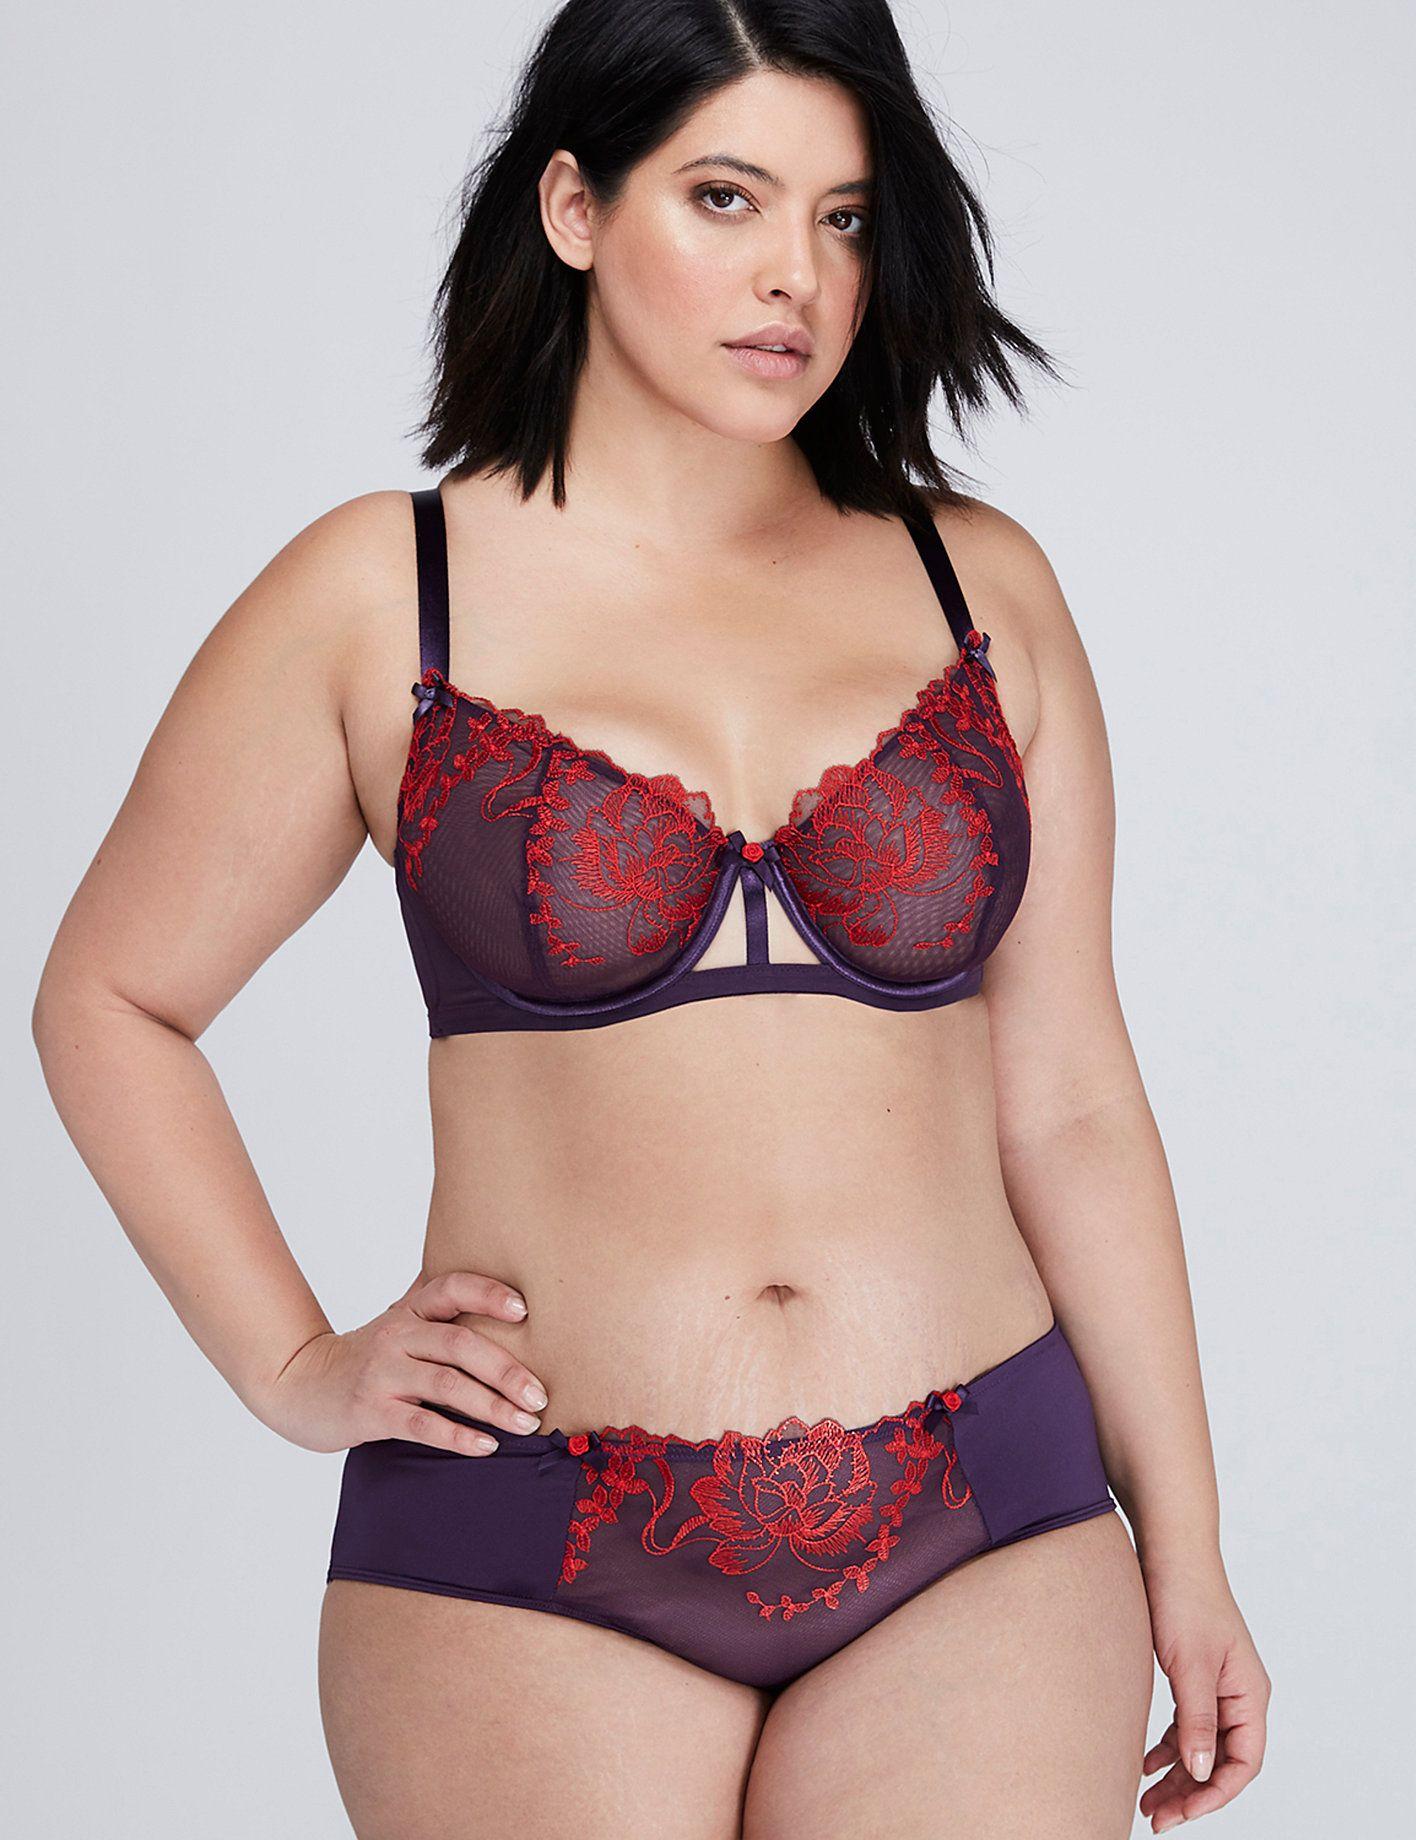 379e37887f59 Plus Size Lingerie & Cacique Intimates | Lane Bryant | Denise Bidot ...